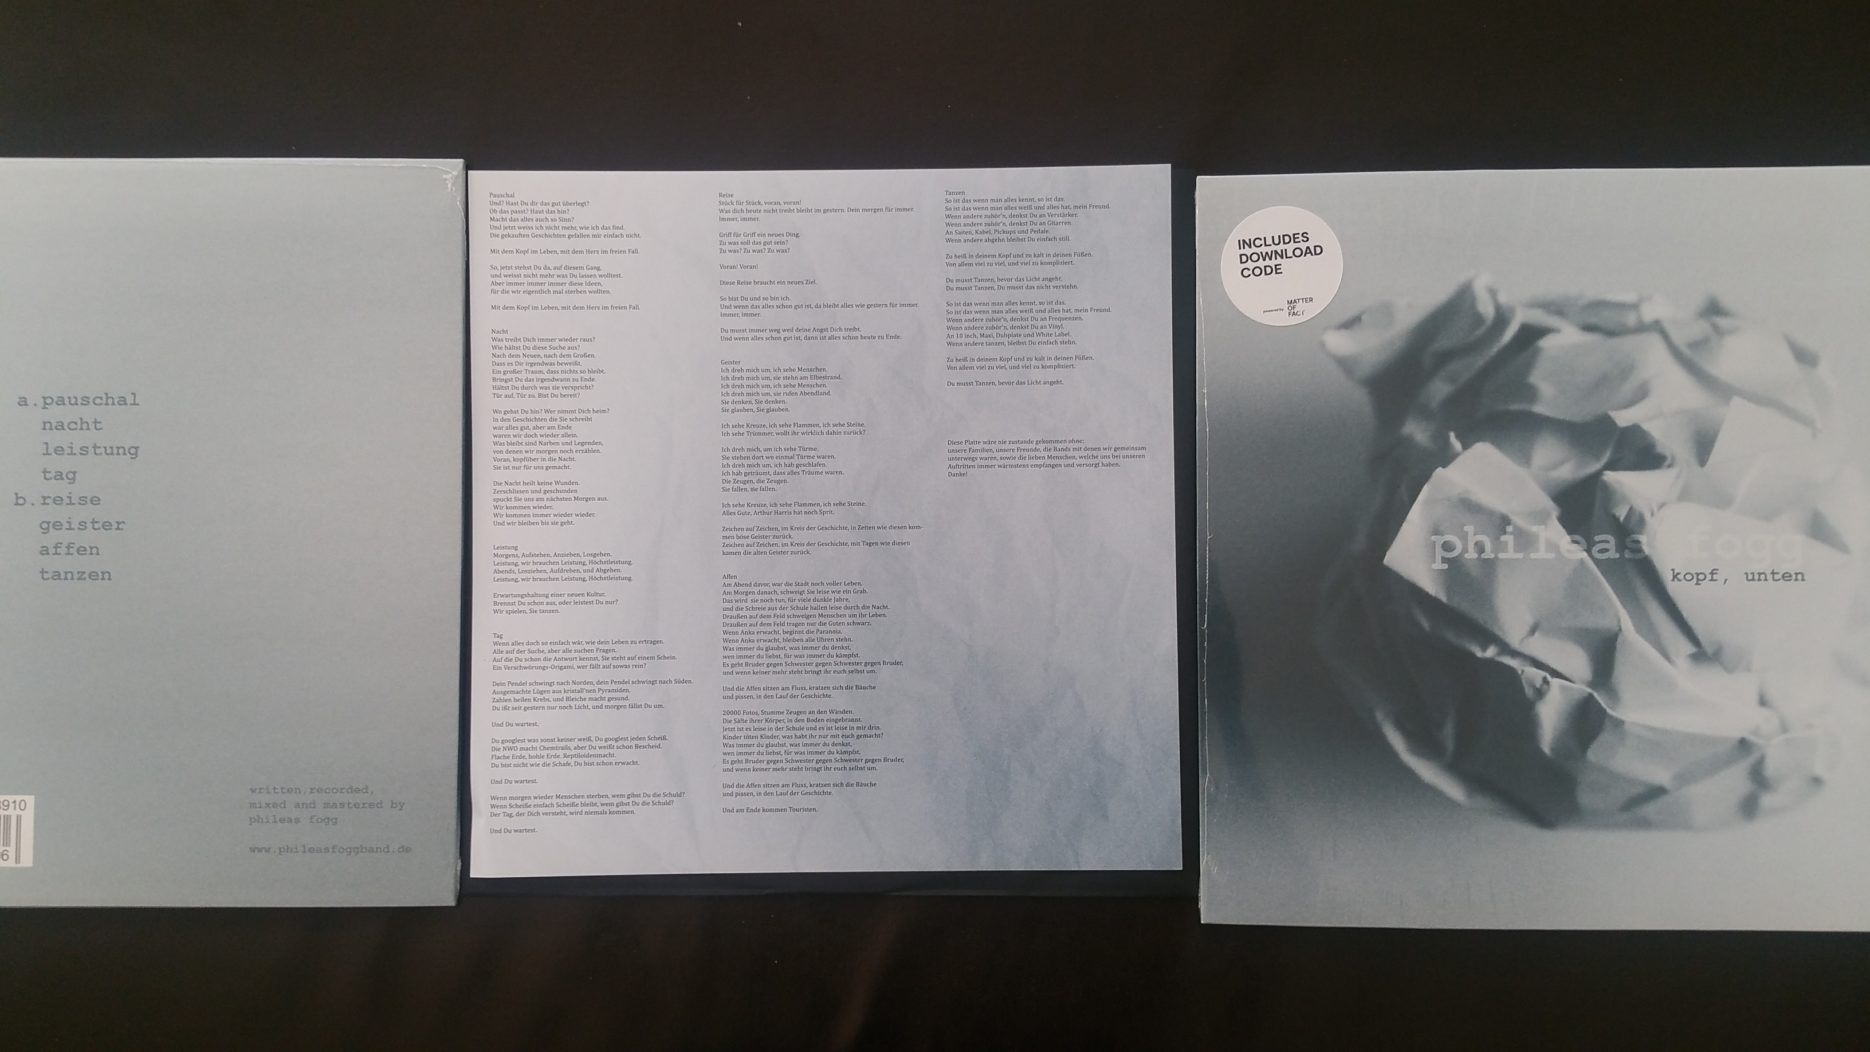 review: PHILEAS FOGG – kopf, unten LP